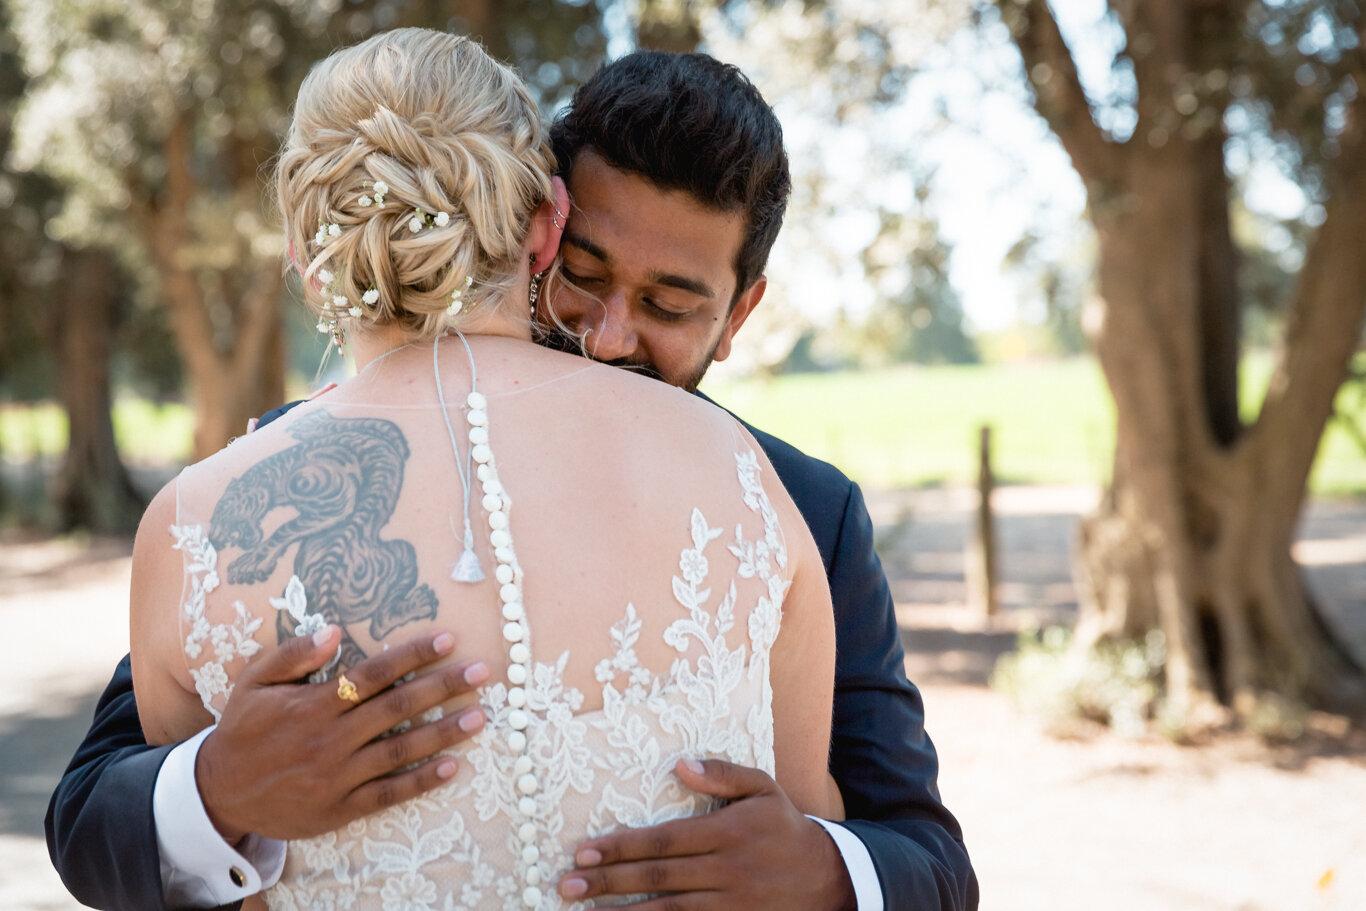 2019.08.24_Emily-Ashir-Wedding-at-the-Maples-5251.jpg